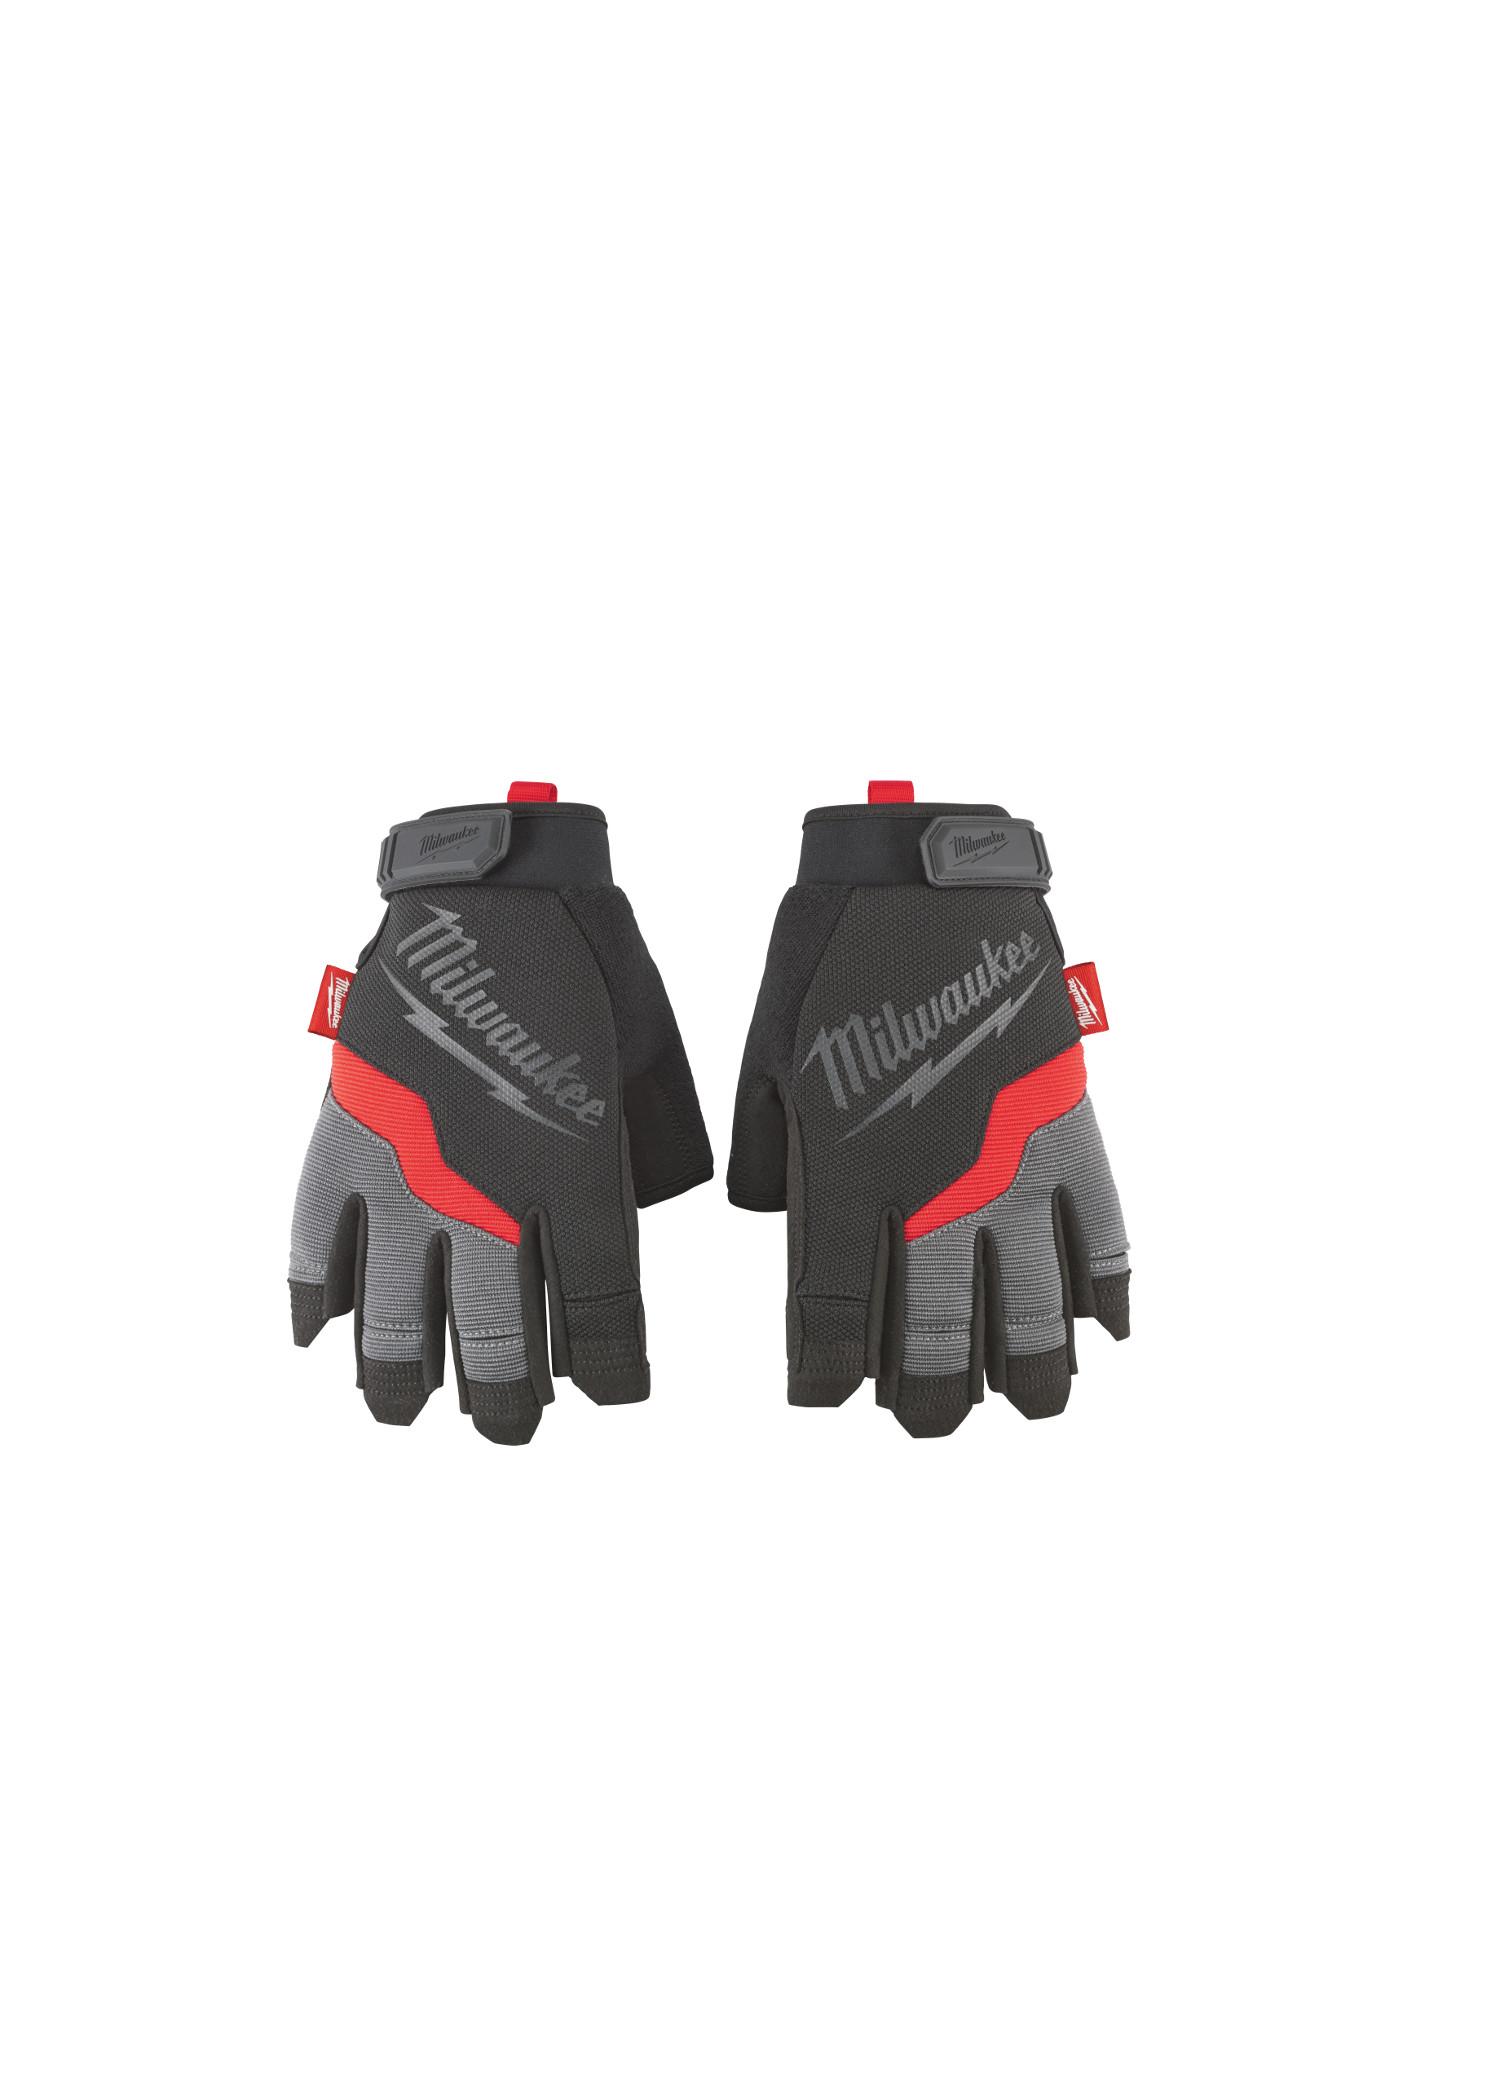 Milwaukee 48-22-8744 Fingerless Work Gloves - XXL